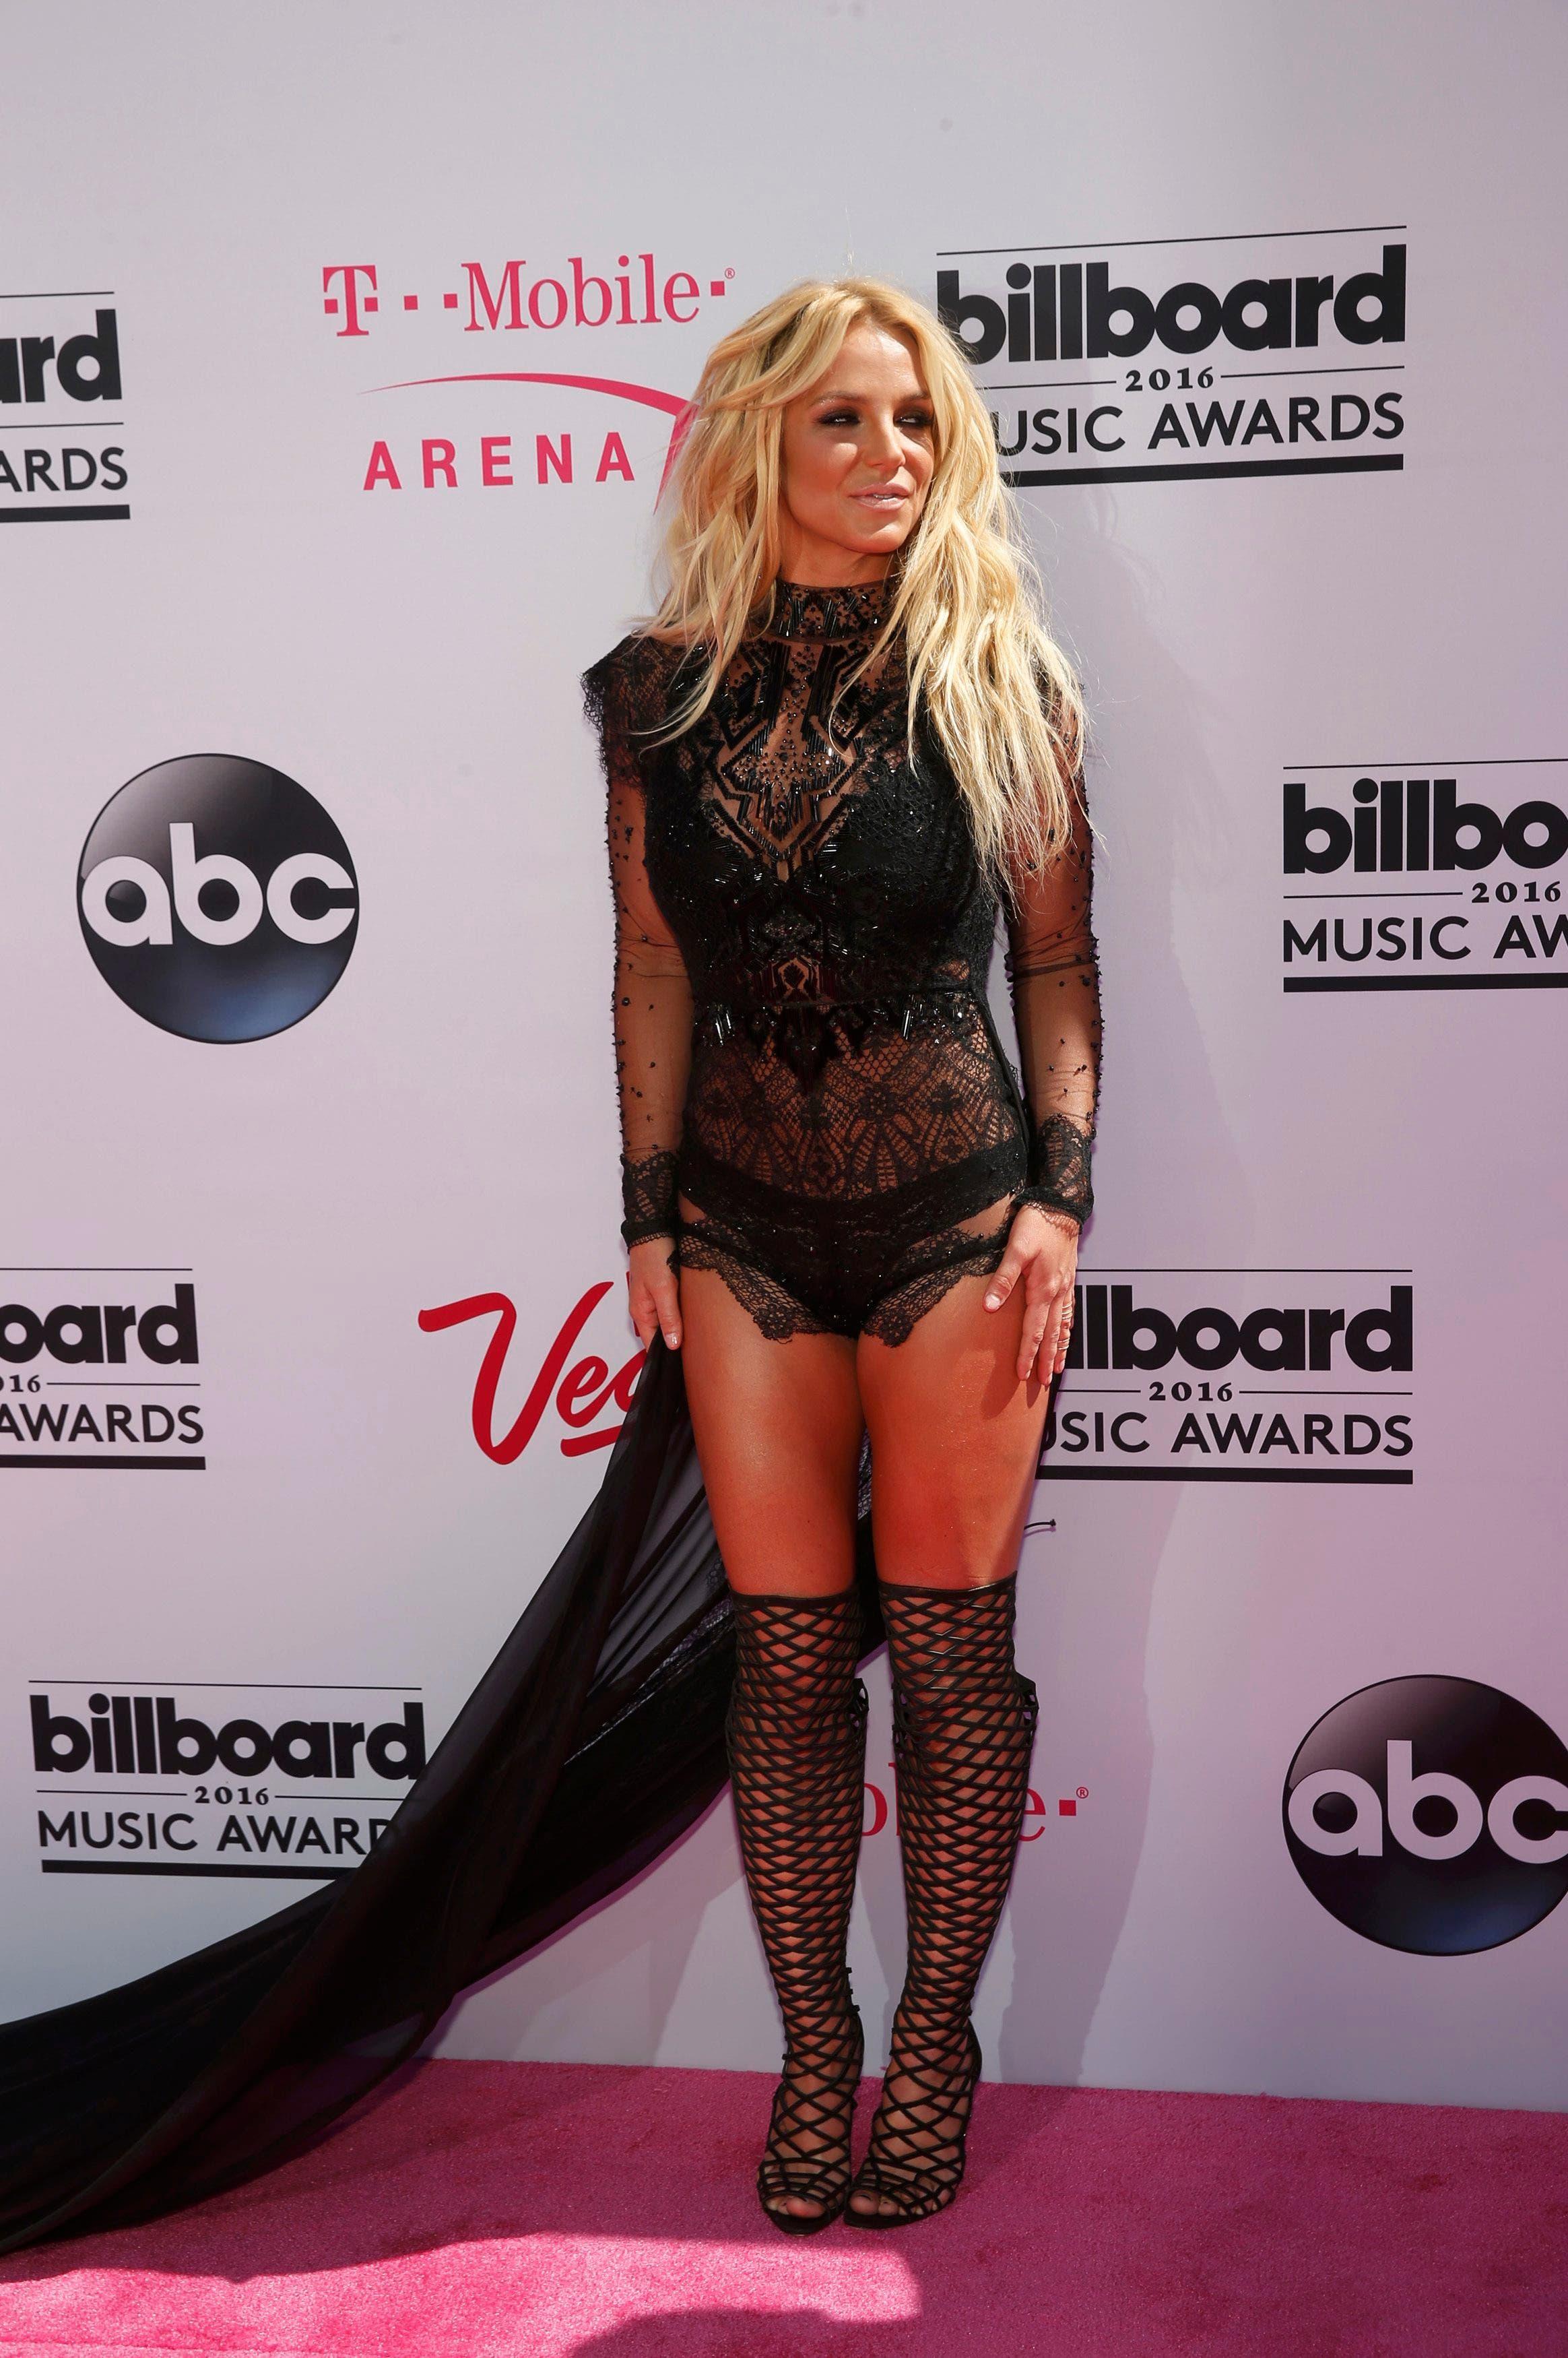 Singer Britney Spears arrives at the 2016 Billboard Awards in Las Vegas, Nevada, US, May 22, 2016. (Reuters)